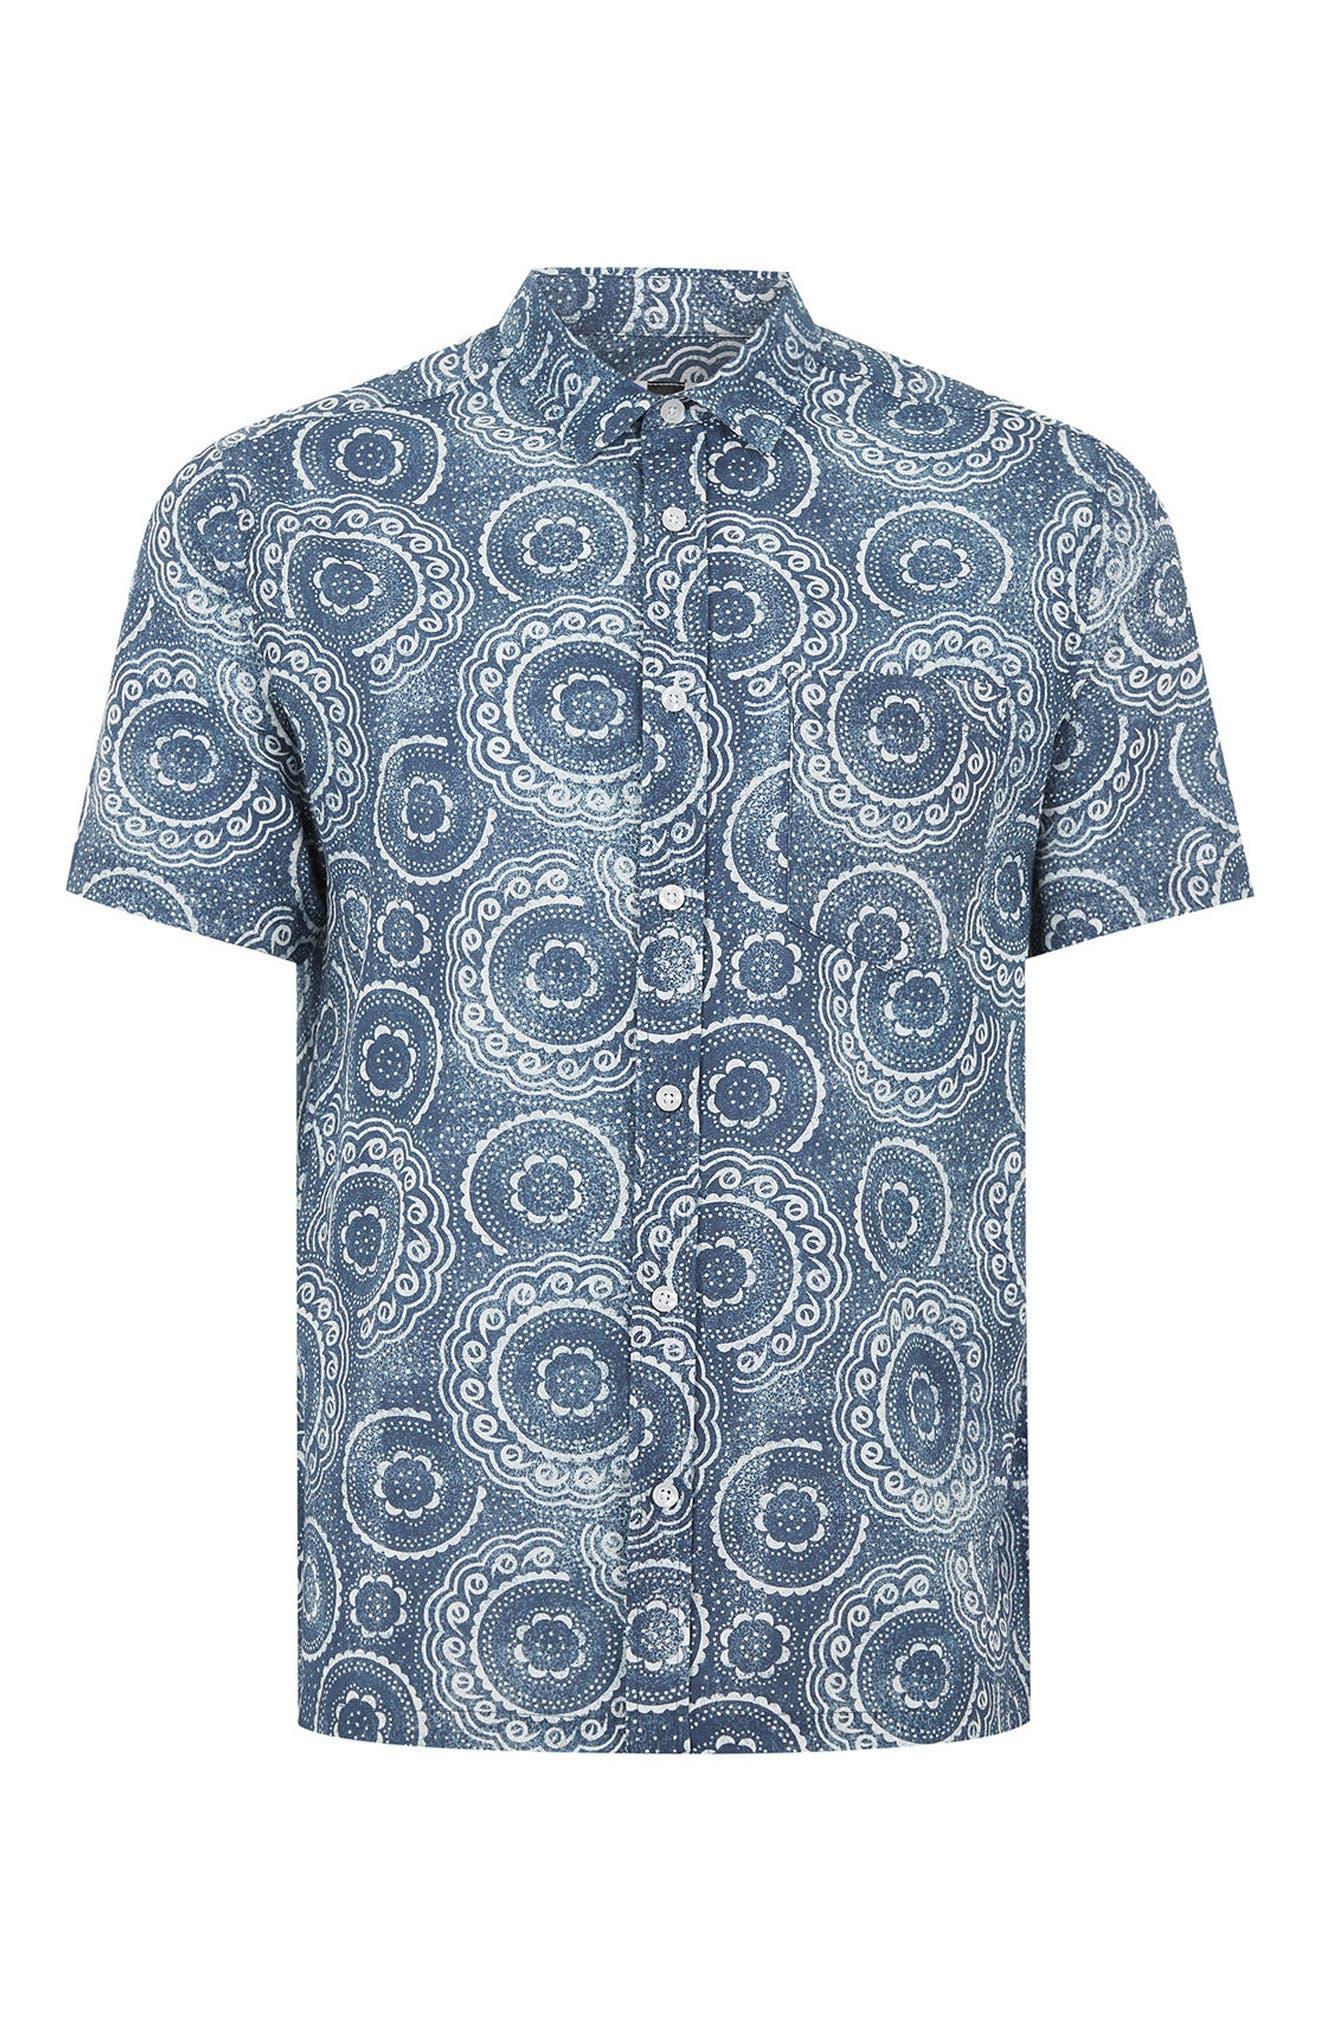 Trim Fit Circle Print Woven Shirt,                             Alternate thumbnail 5, color,